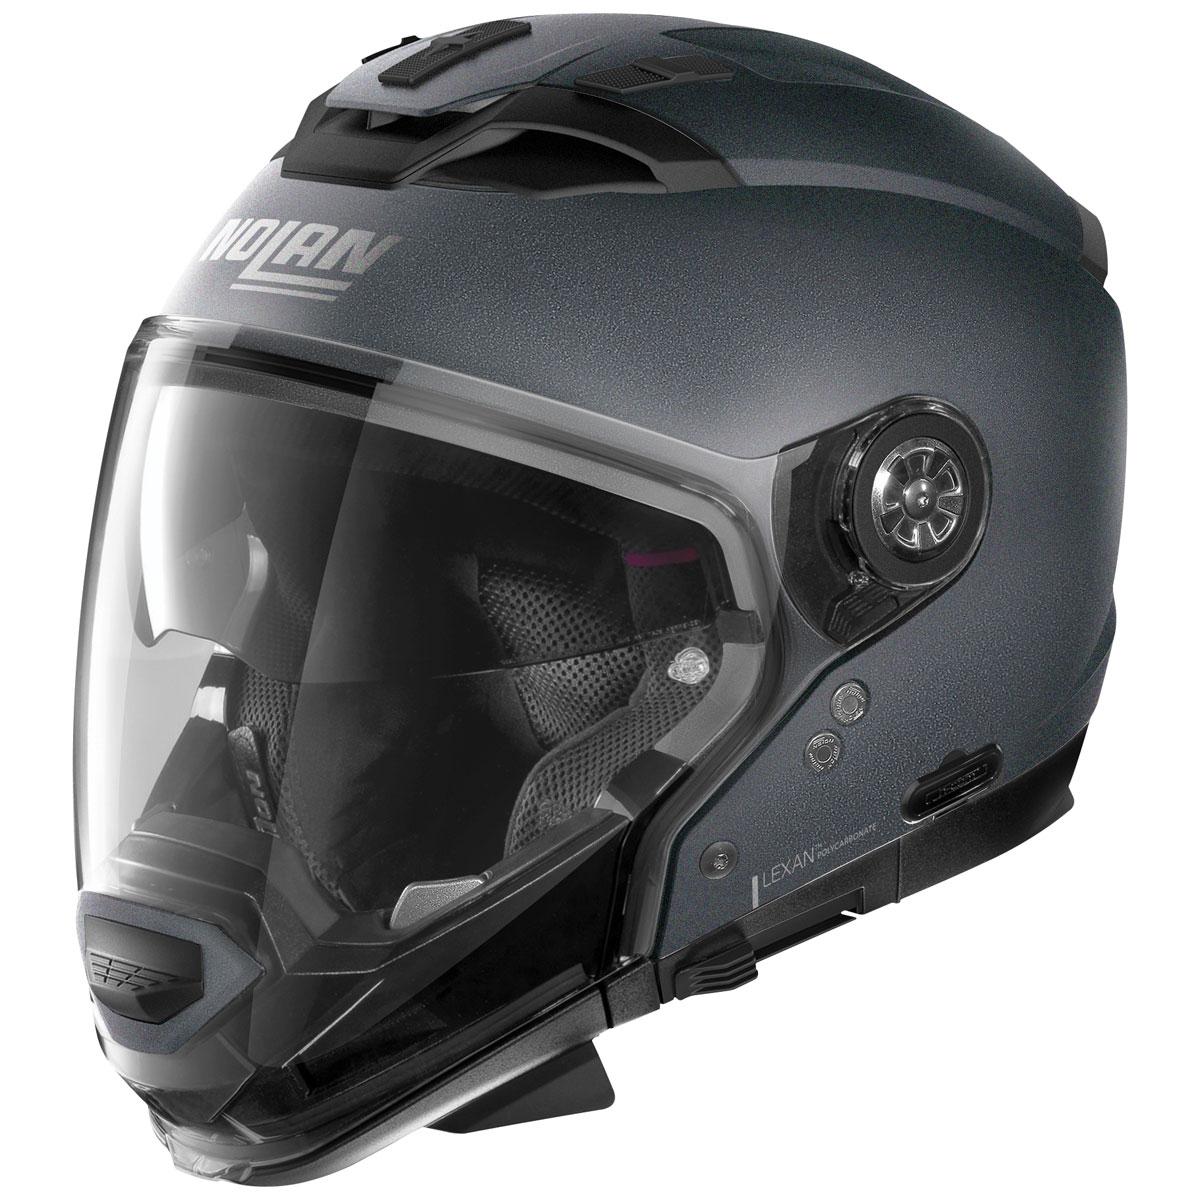 Nolan N70-2 GT Black Graphite Modular Helmet